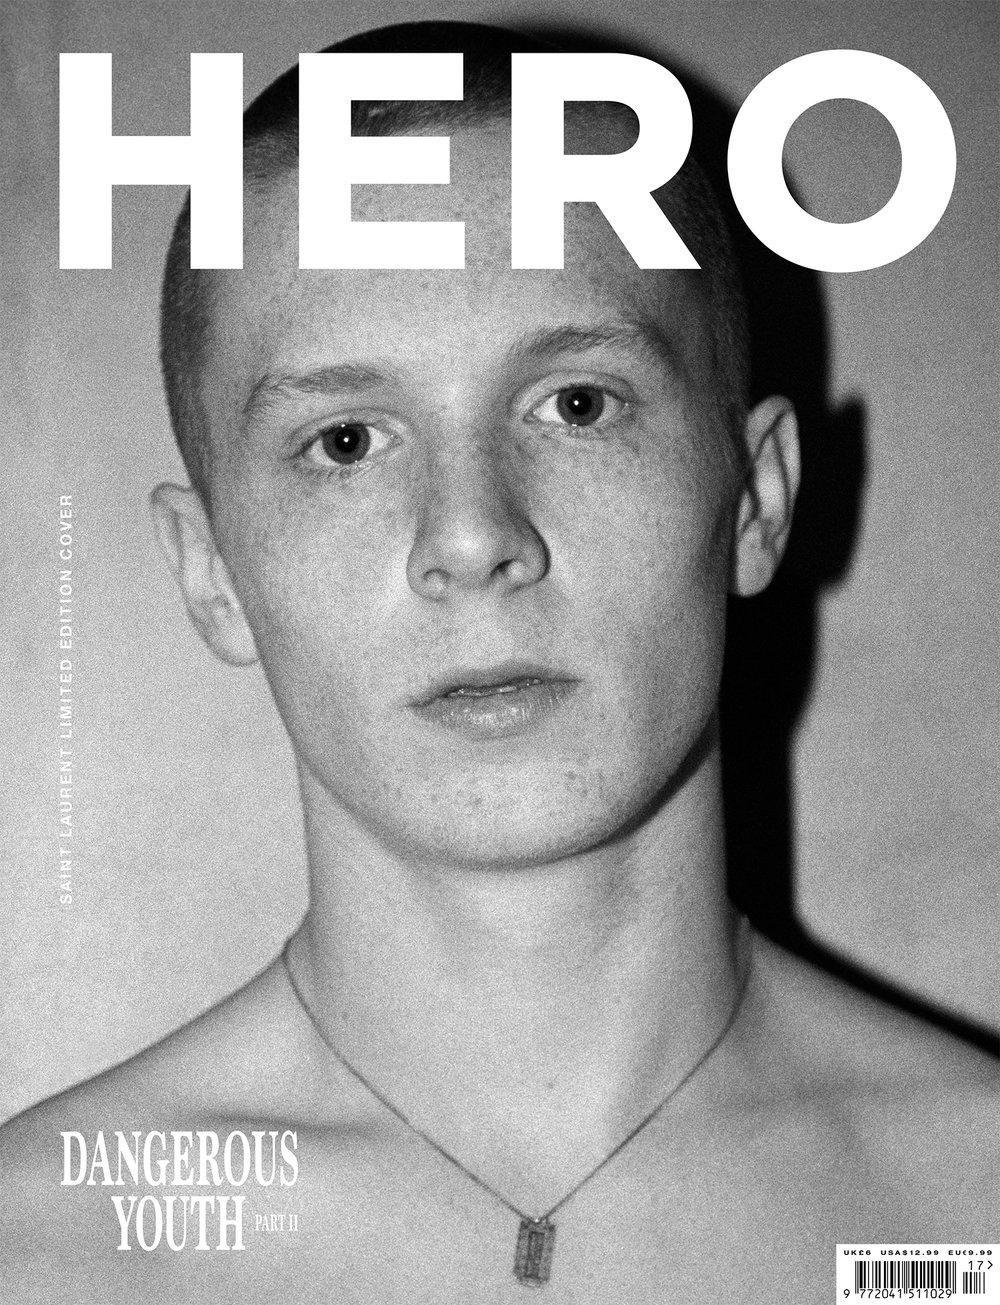 Fabien_Kruszelnicki_HERO-17__COVER_SL_76313.jpg